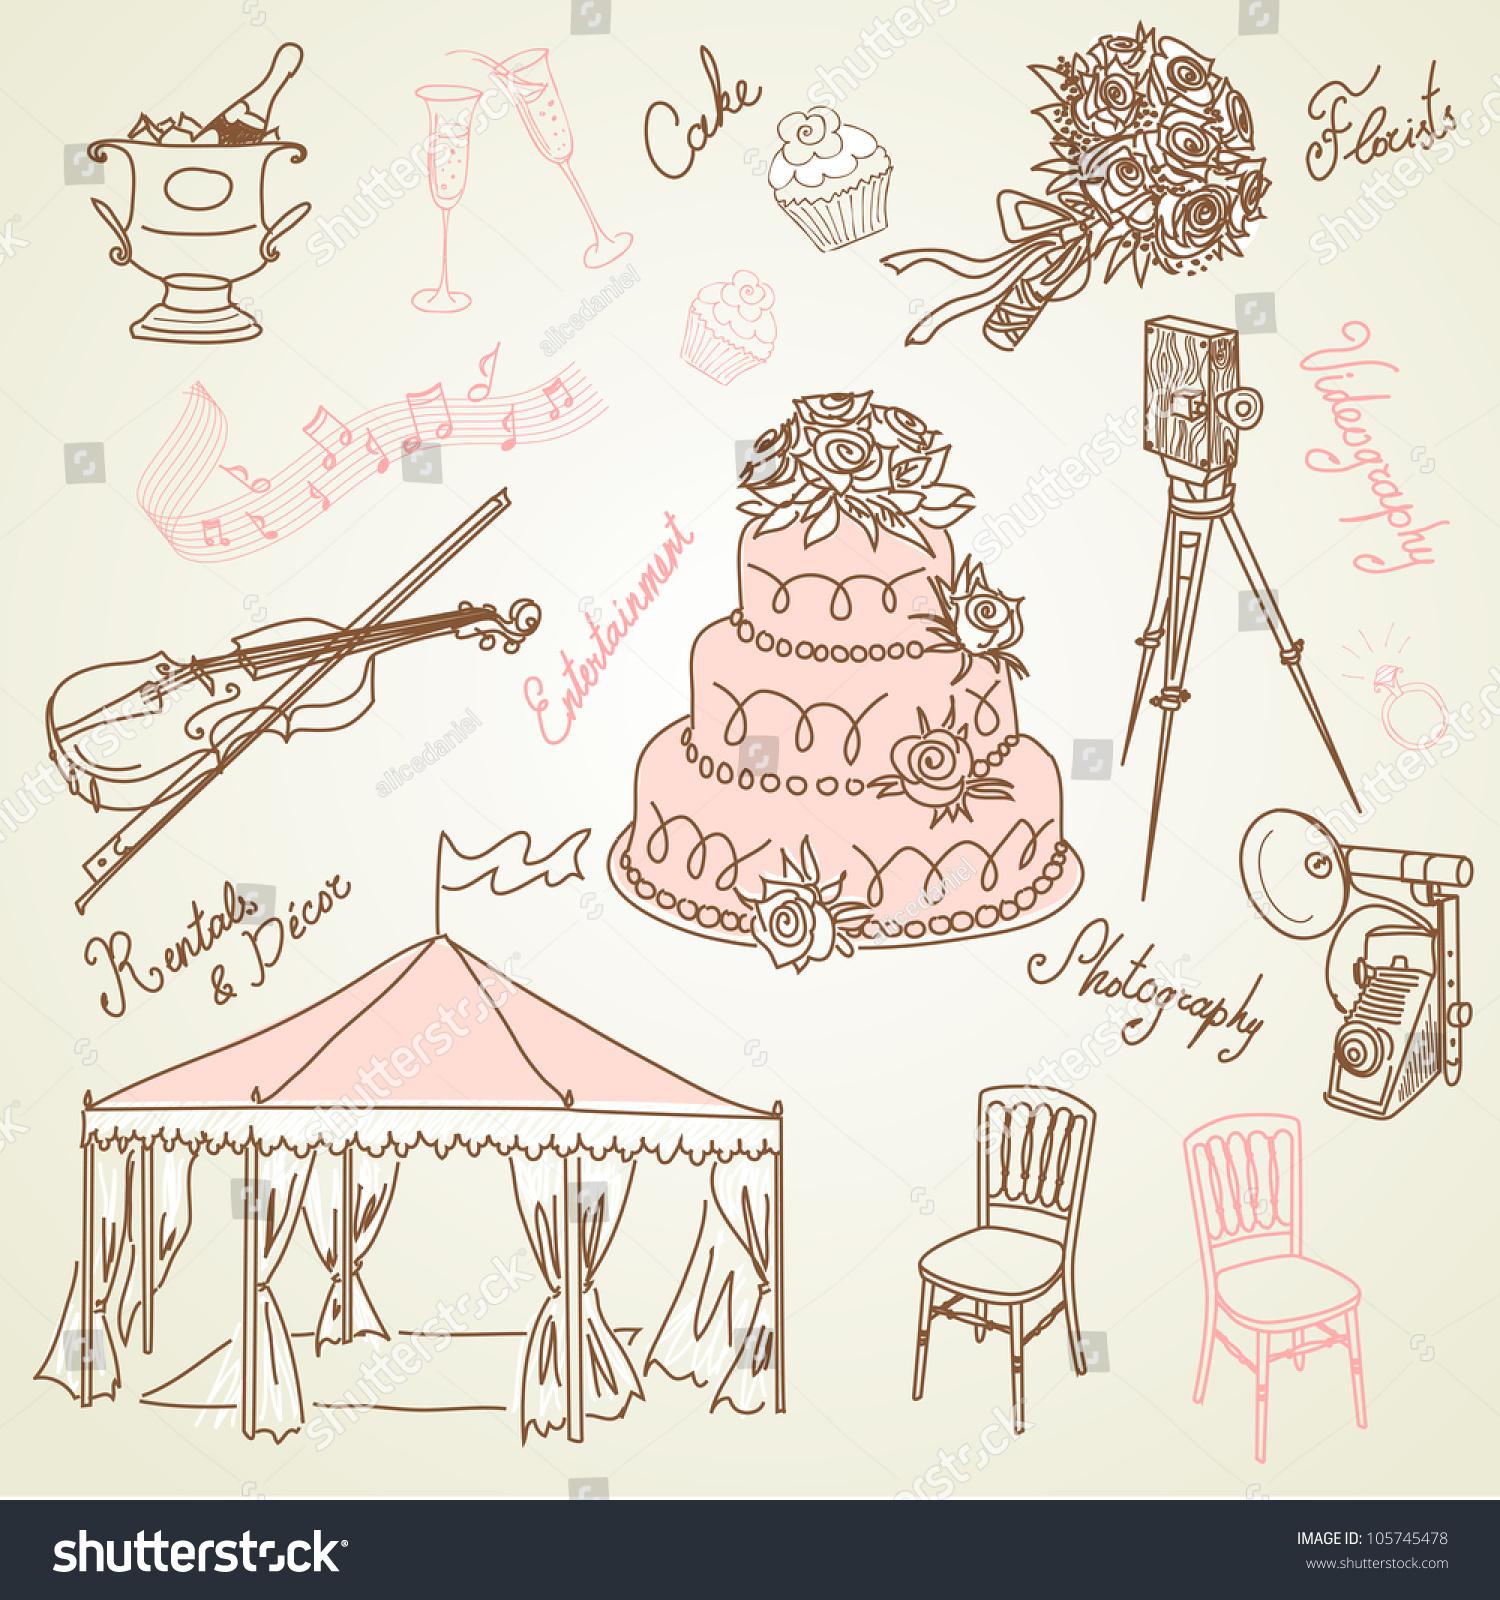 Set Of Beautiful Wedding Doodles. Everything That You Need